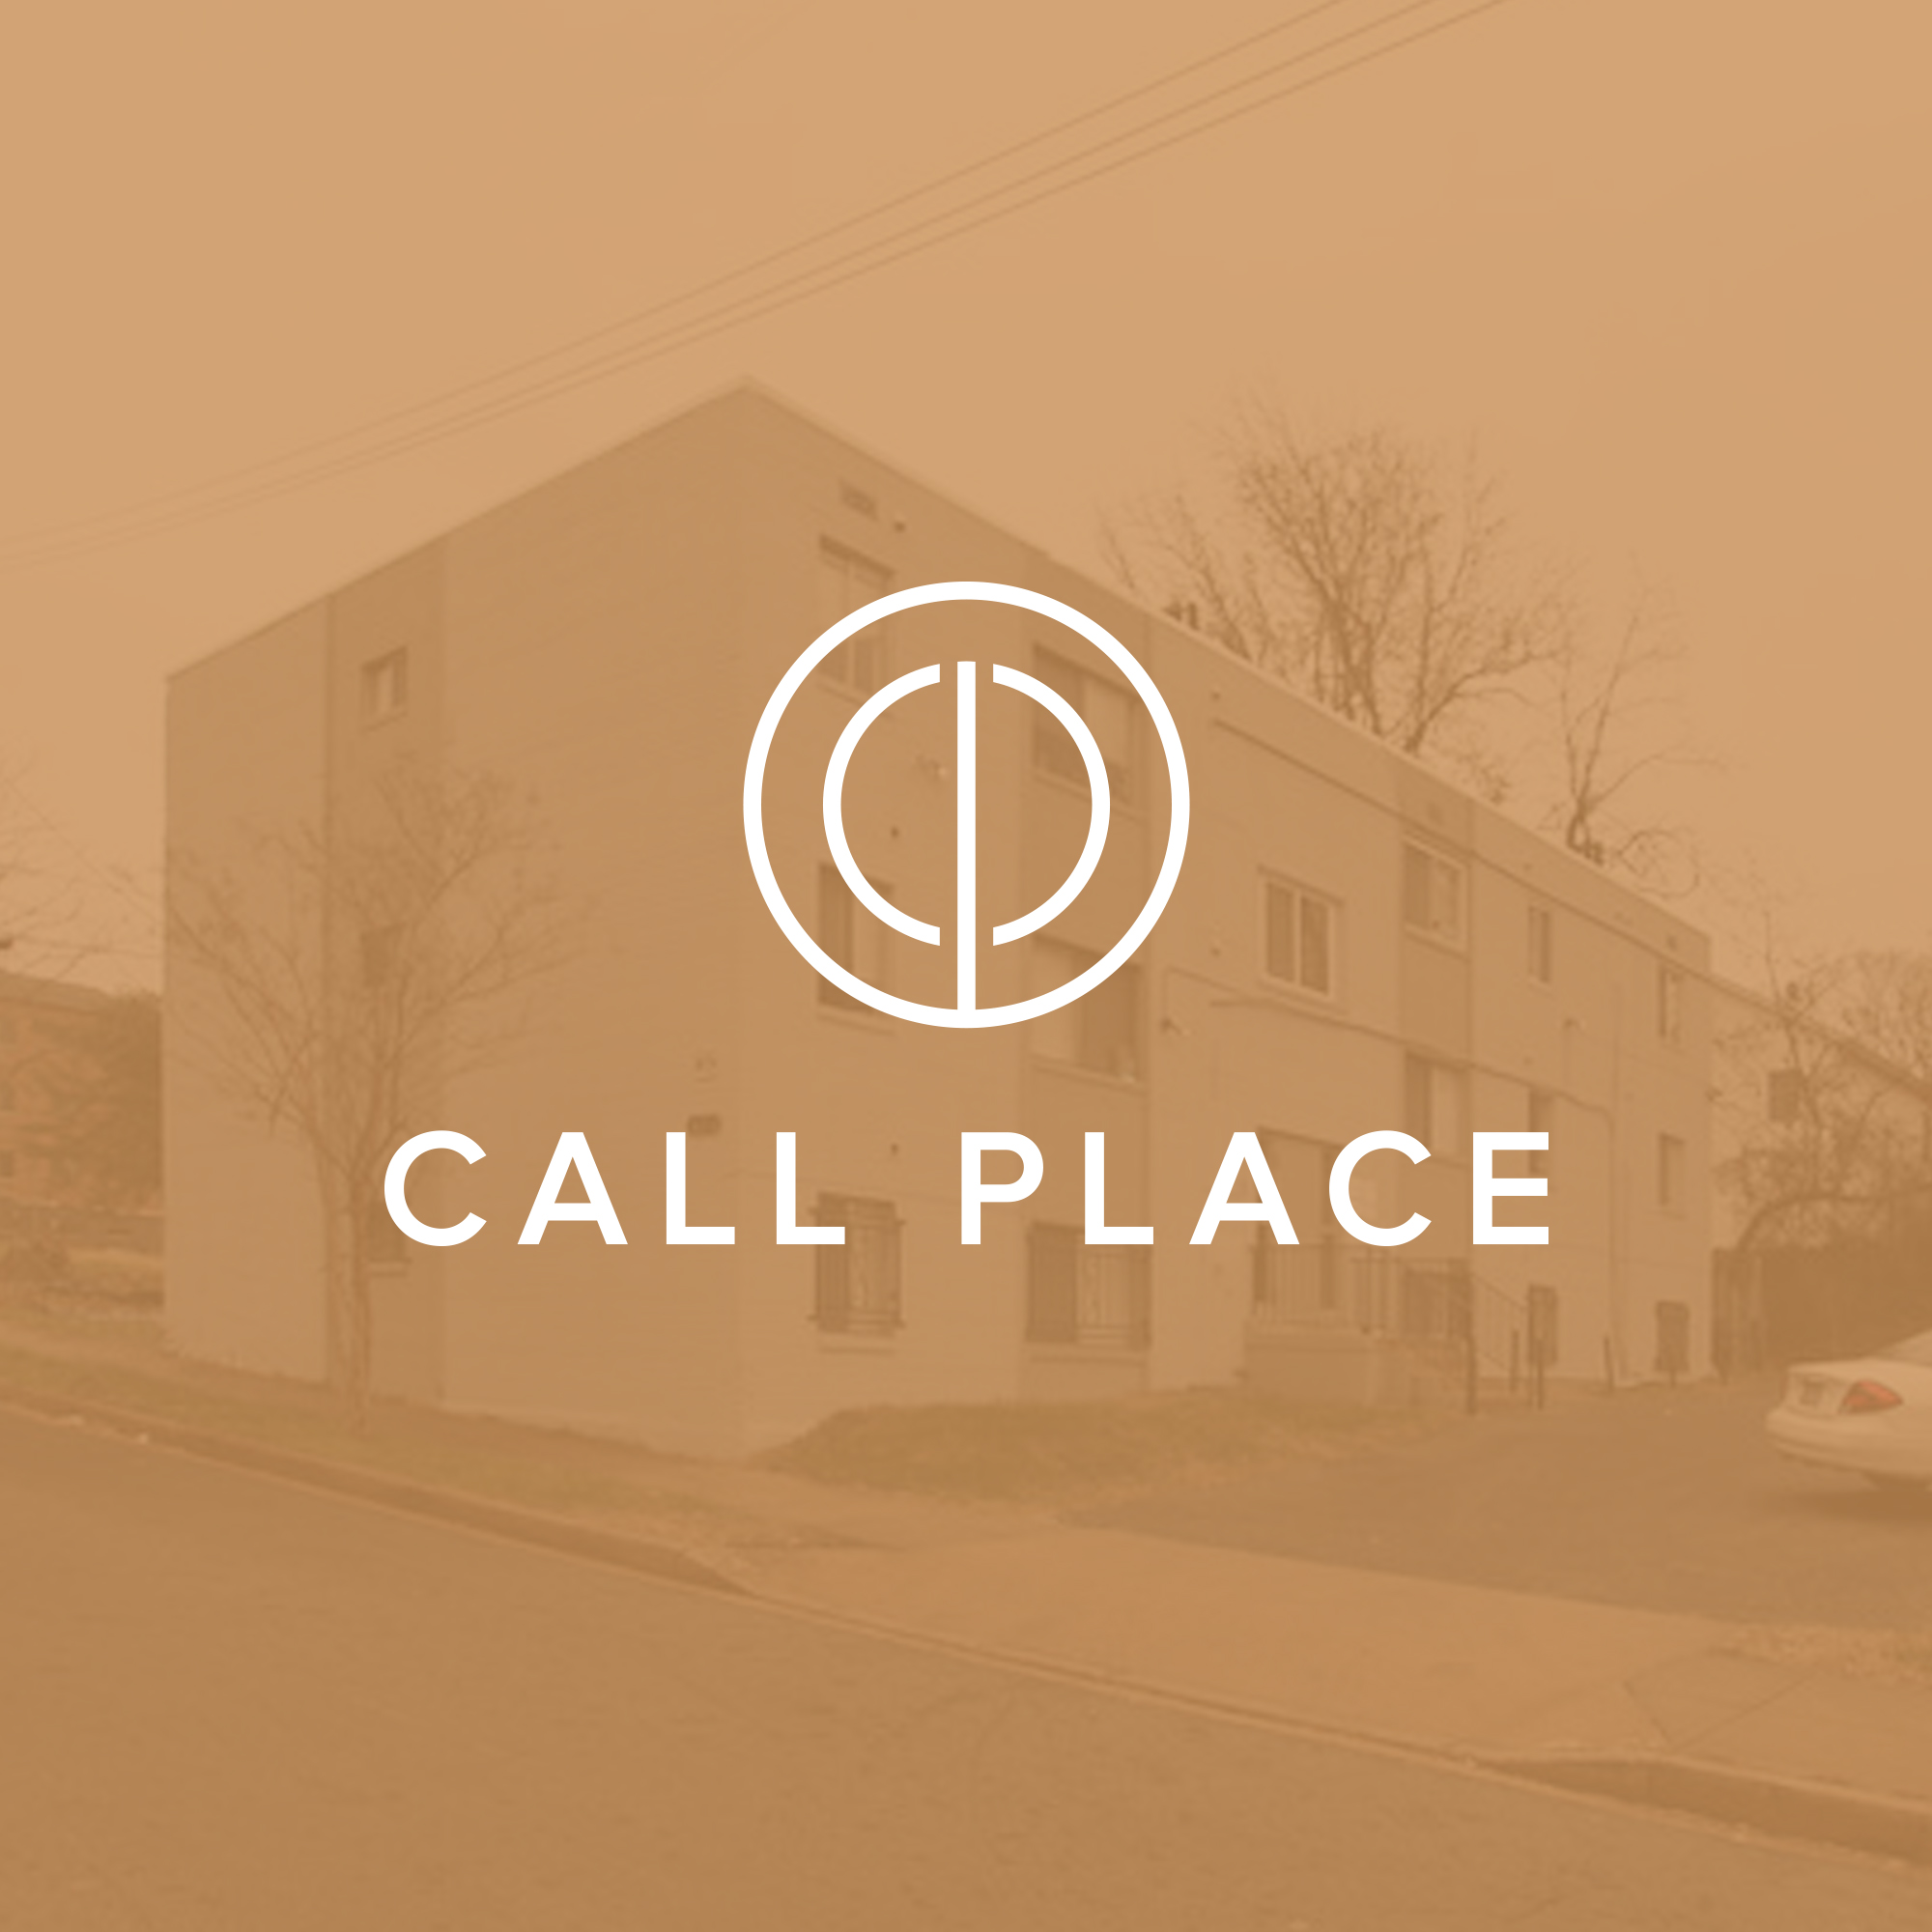 CallPlace_Logo.jpg